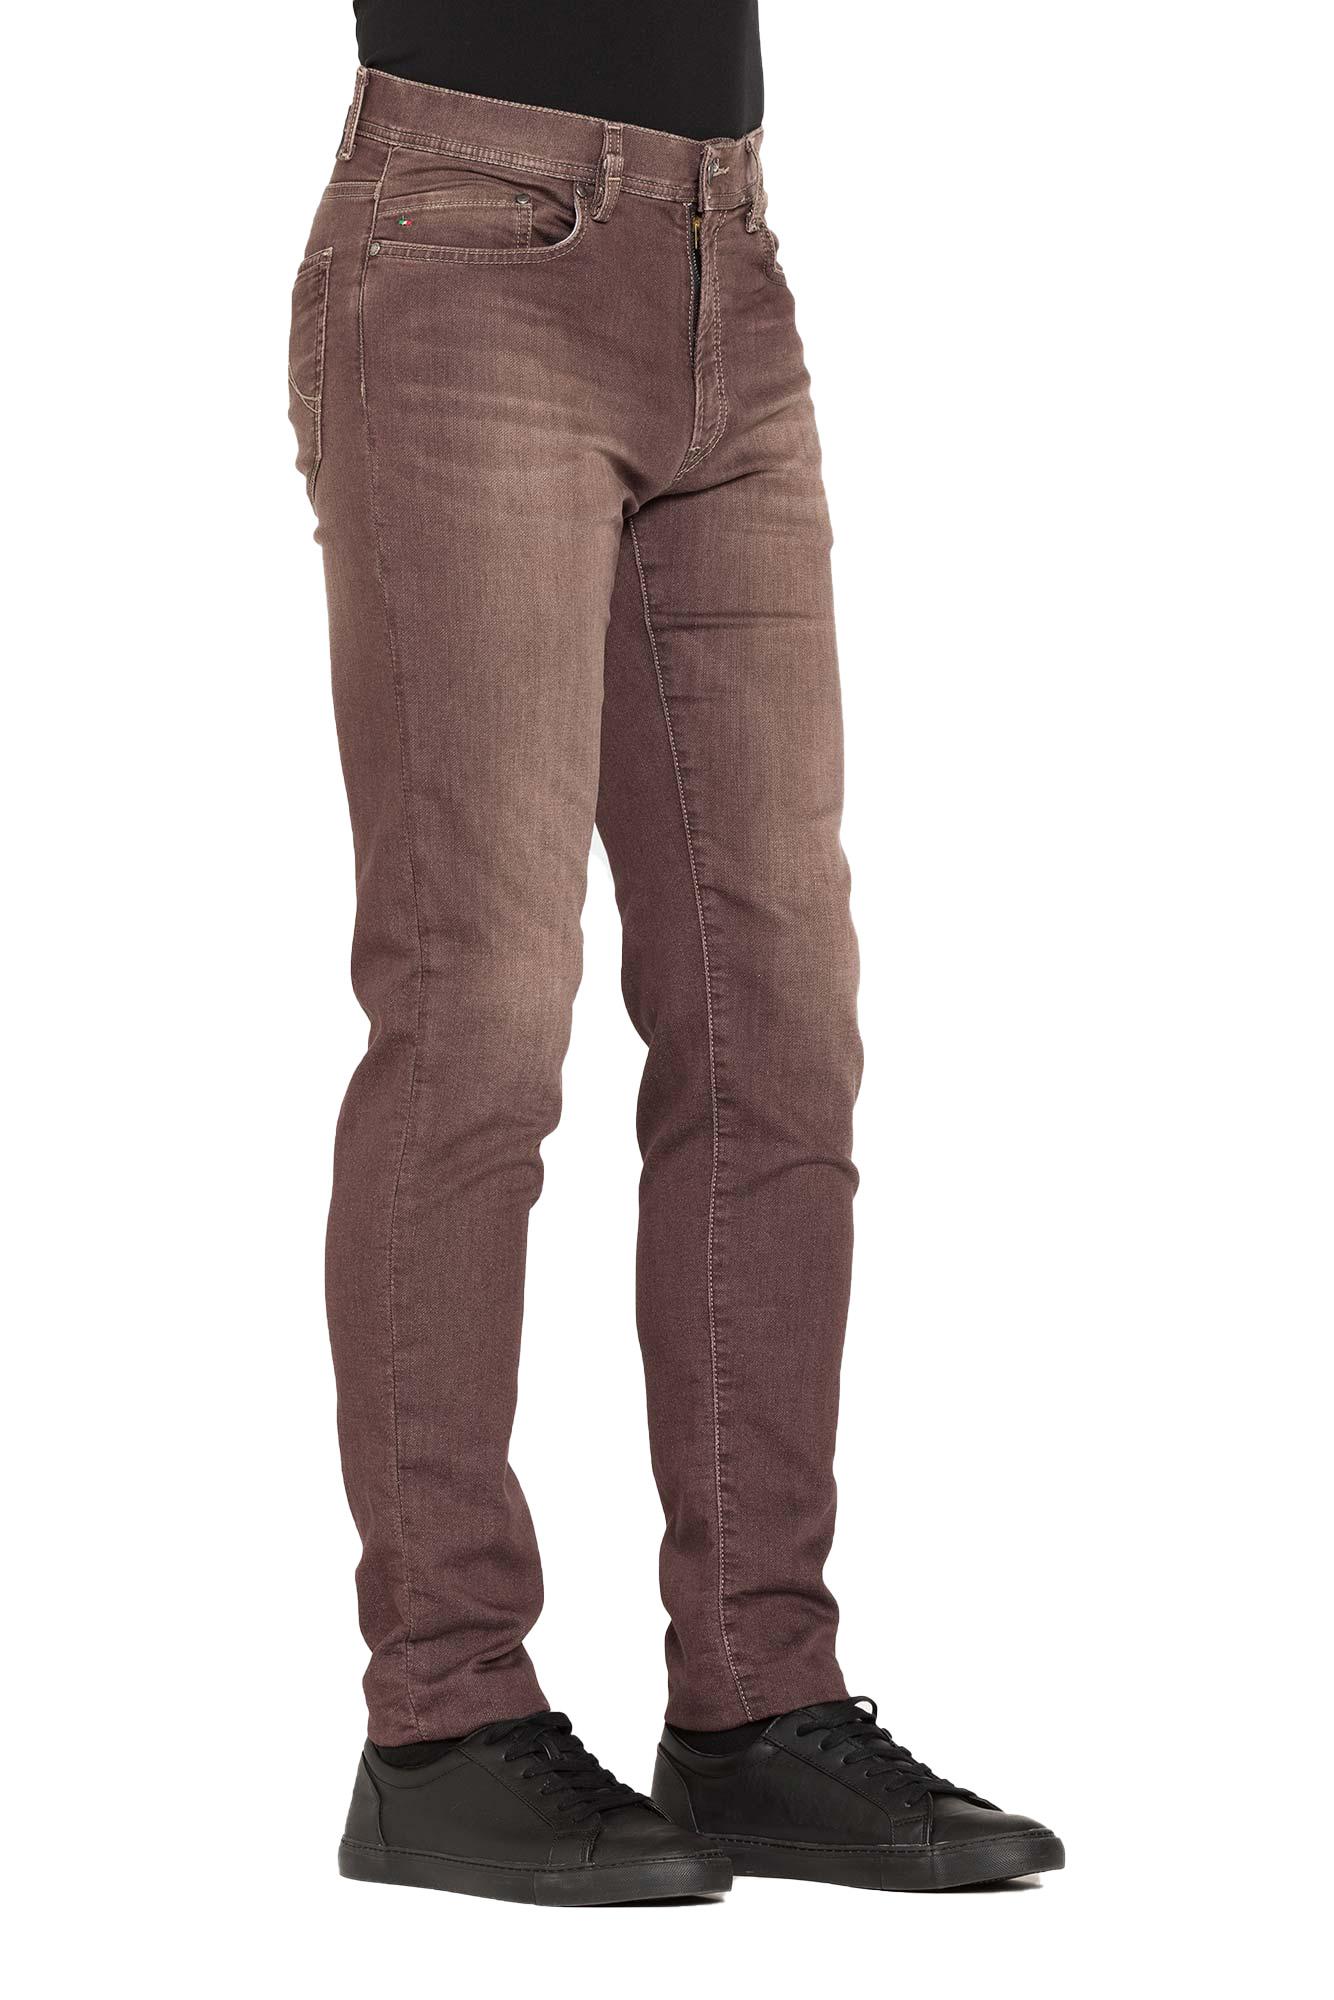 Carrera-Jeans-Jeans-per-uomo-tinta-unita miniatura 6